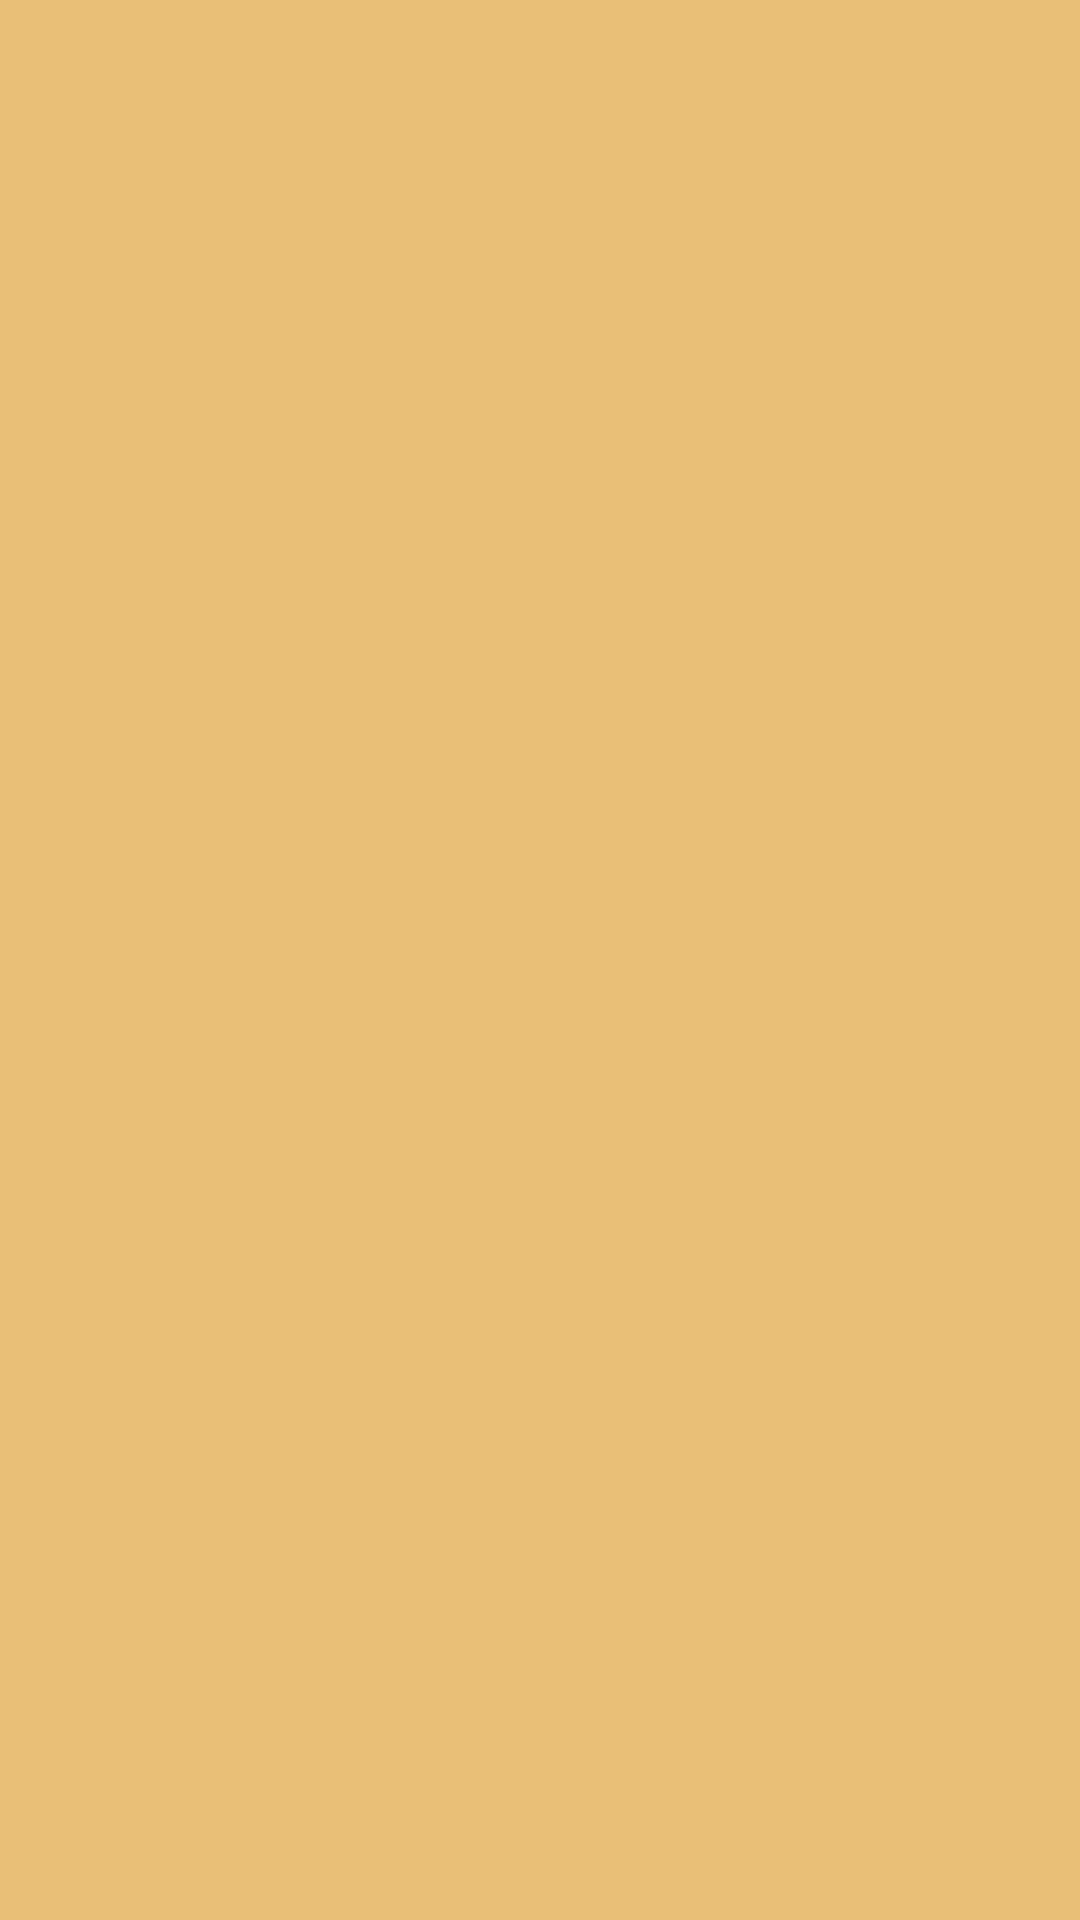 Sunflower Yellow. | Colors | Pinterest | Sunflowers